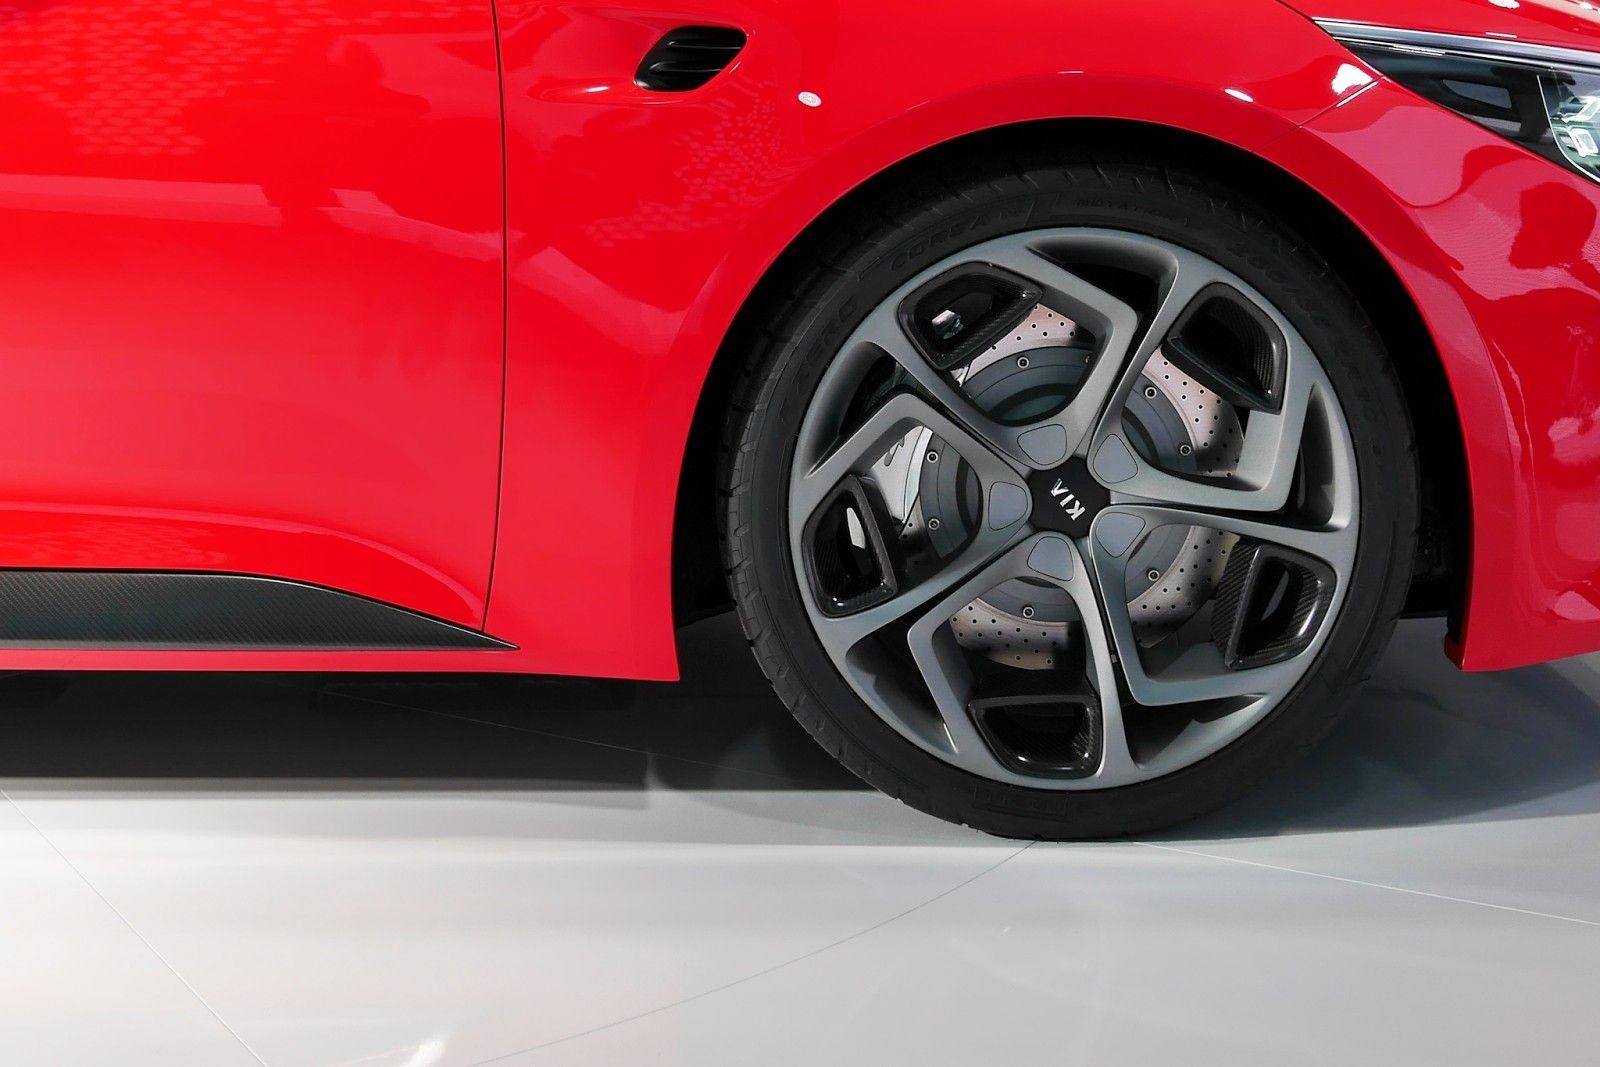 Exploring Kia Designs at Gevena International Motor Show